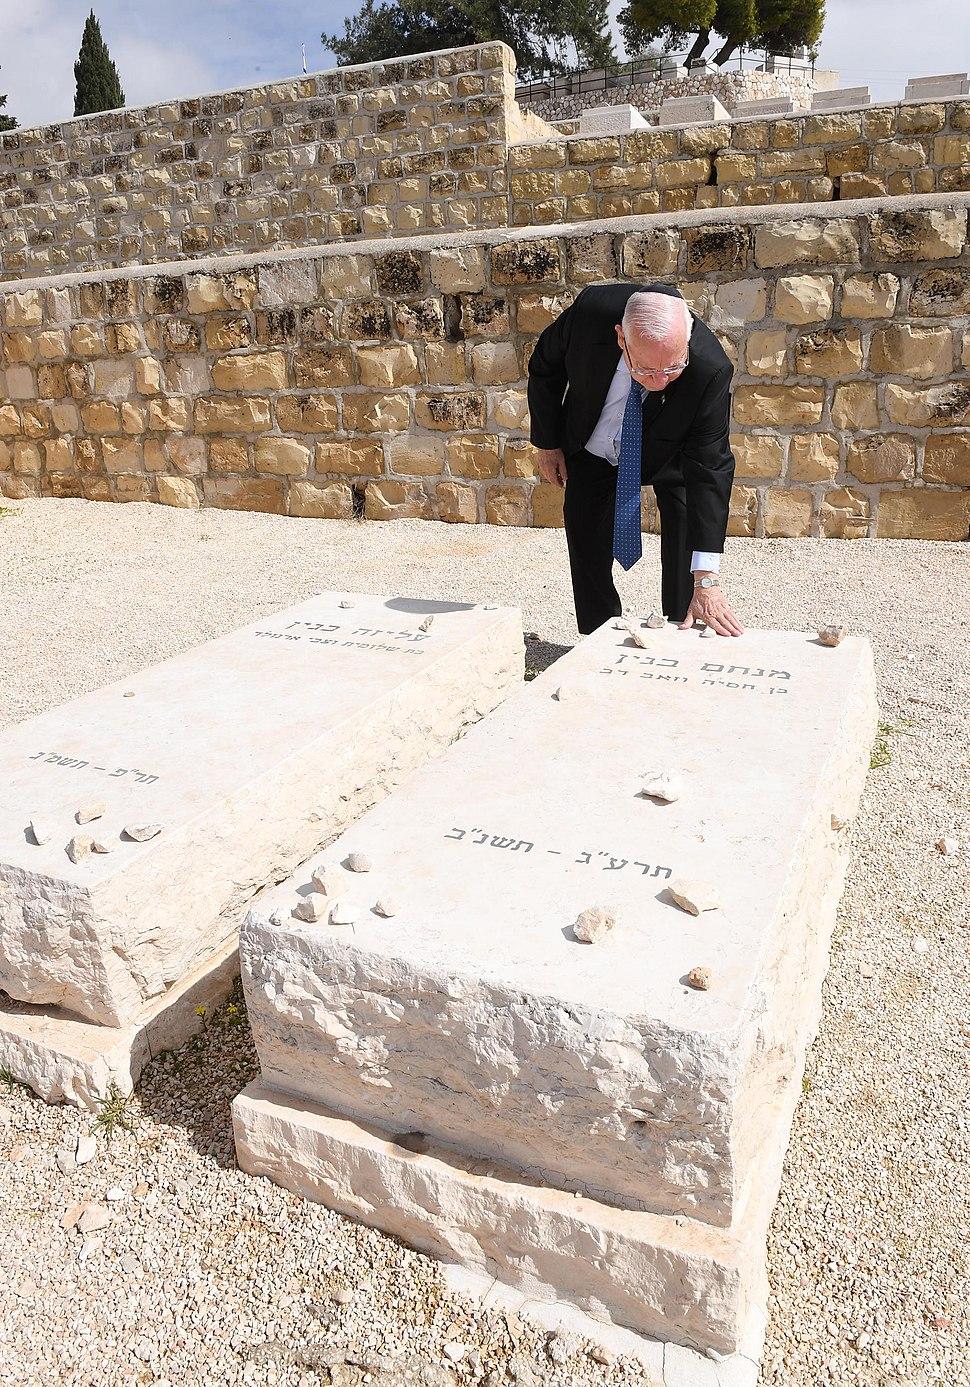 Reuven Rivlin visiting the grave of Menachem Begin, February 2018 (8305)